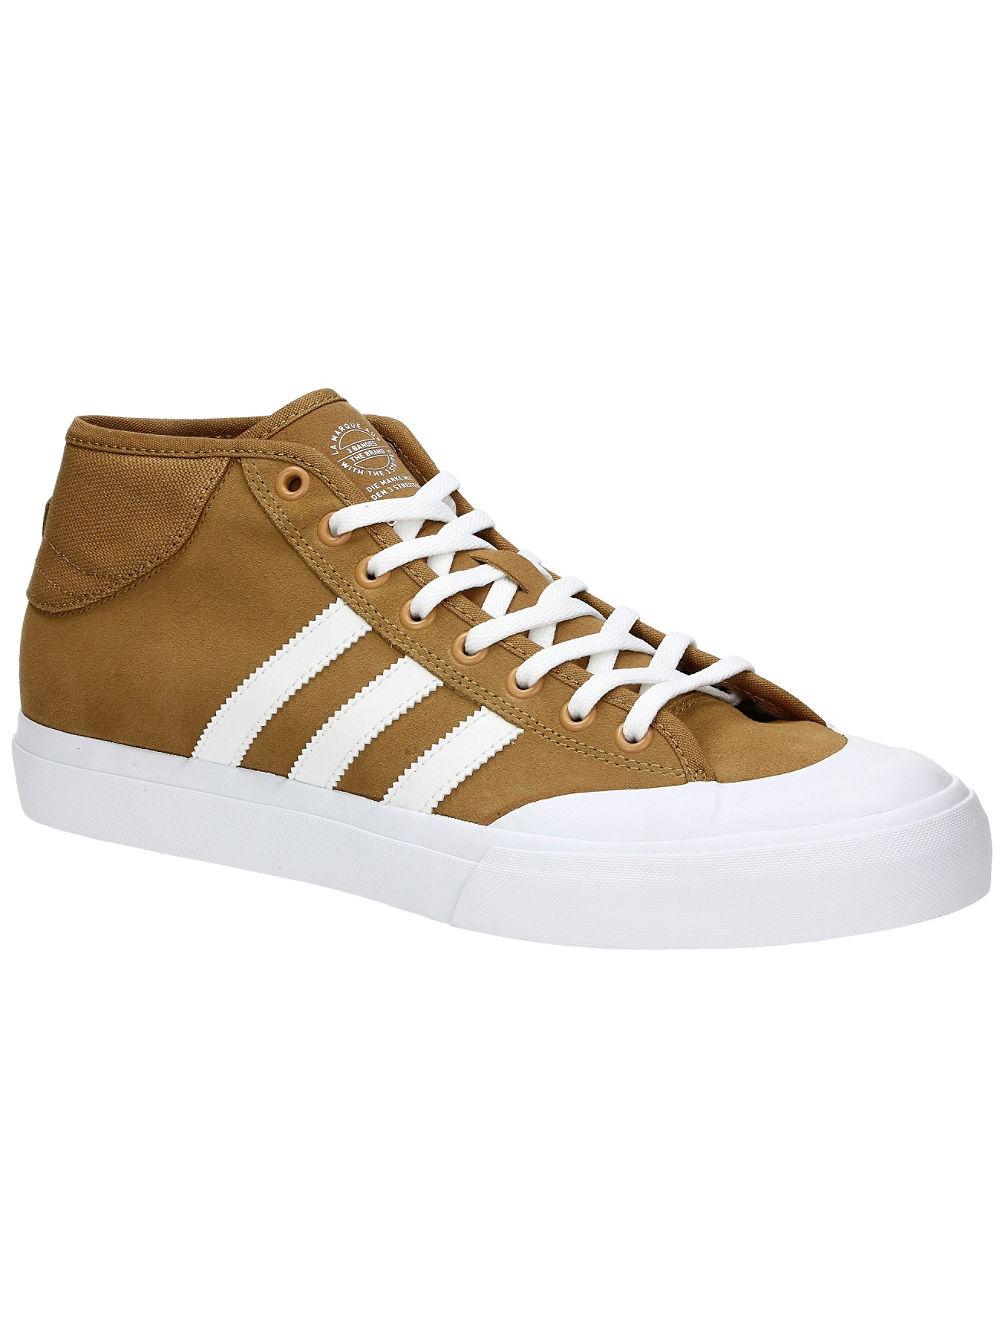 adidas-skateboarding-matchcourt-mid-adv-skate-shoes